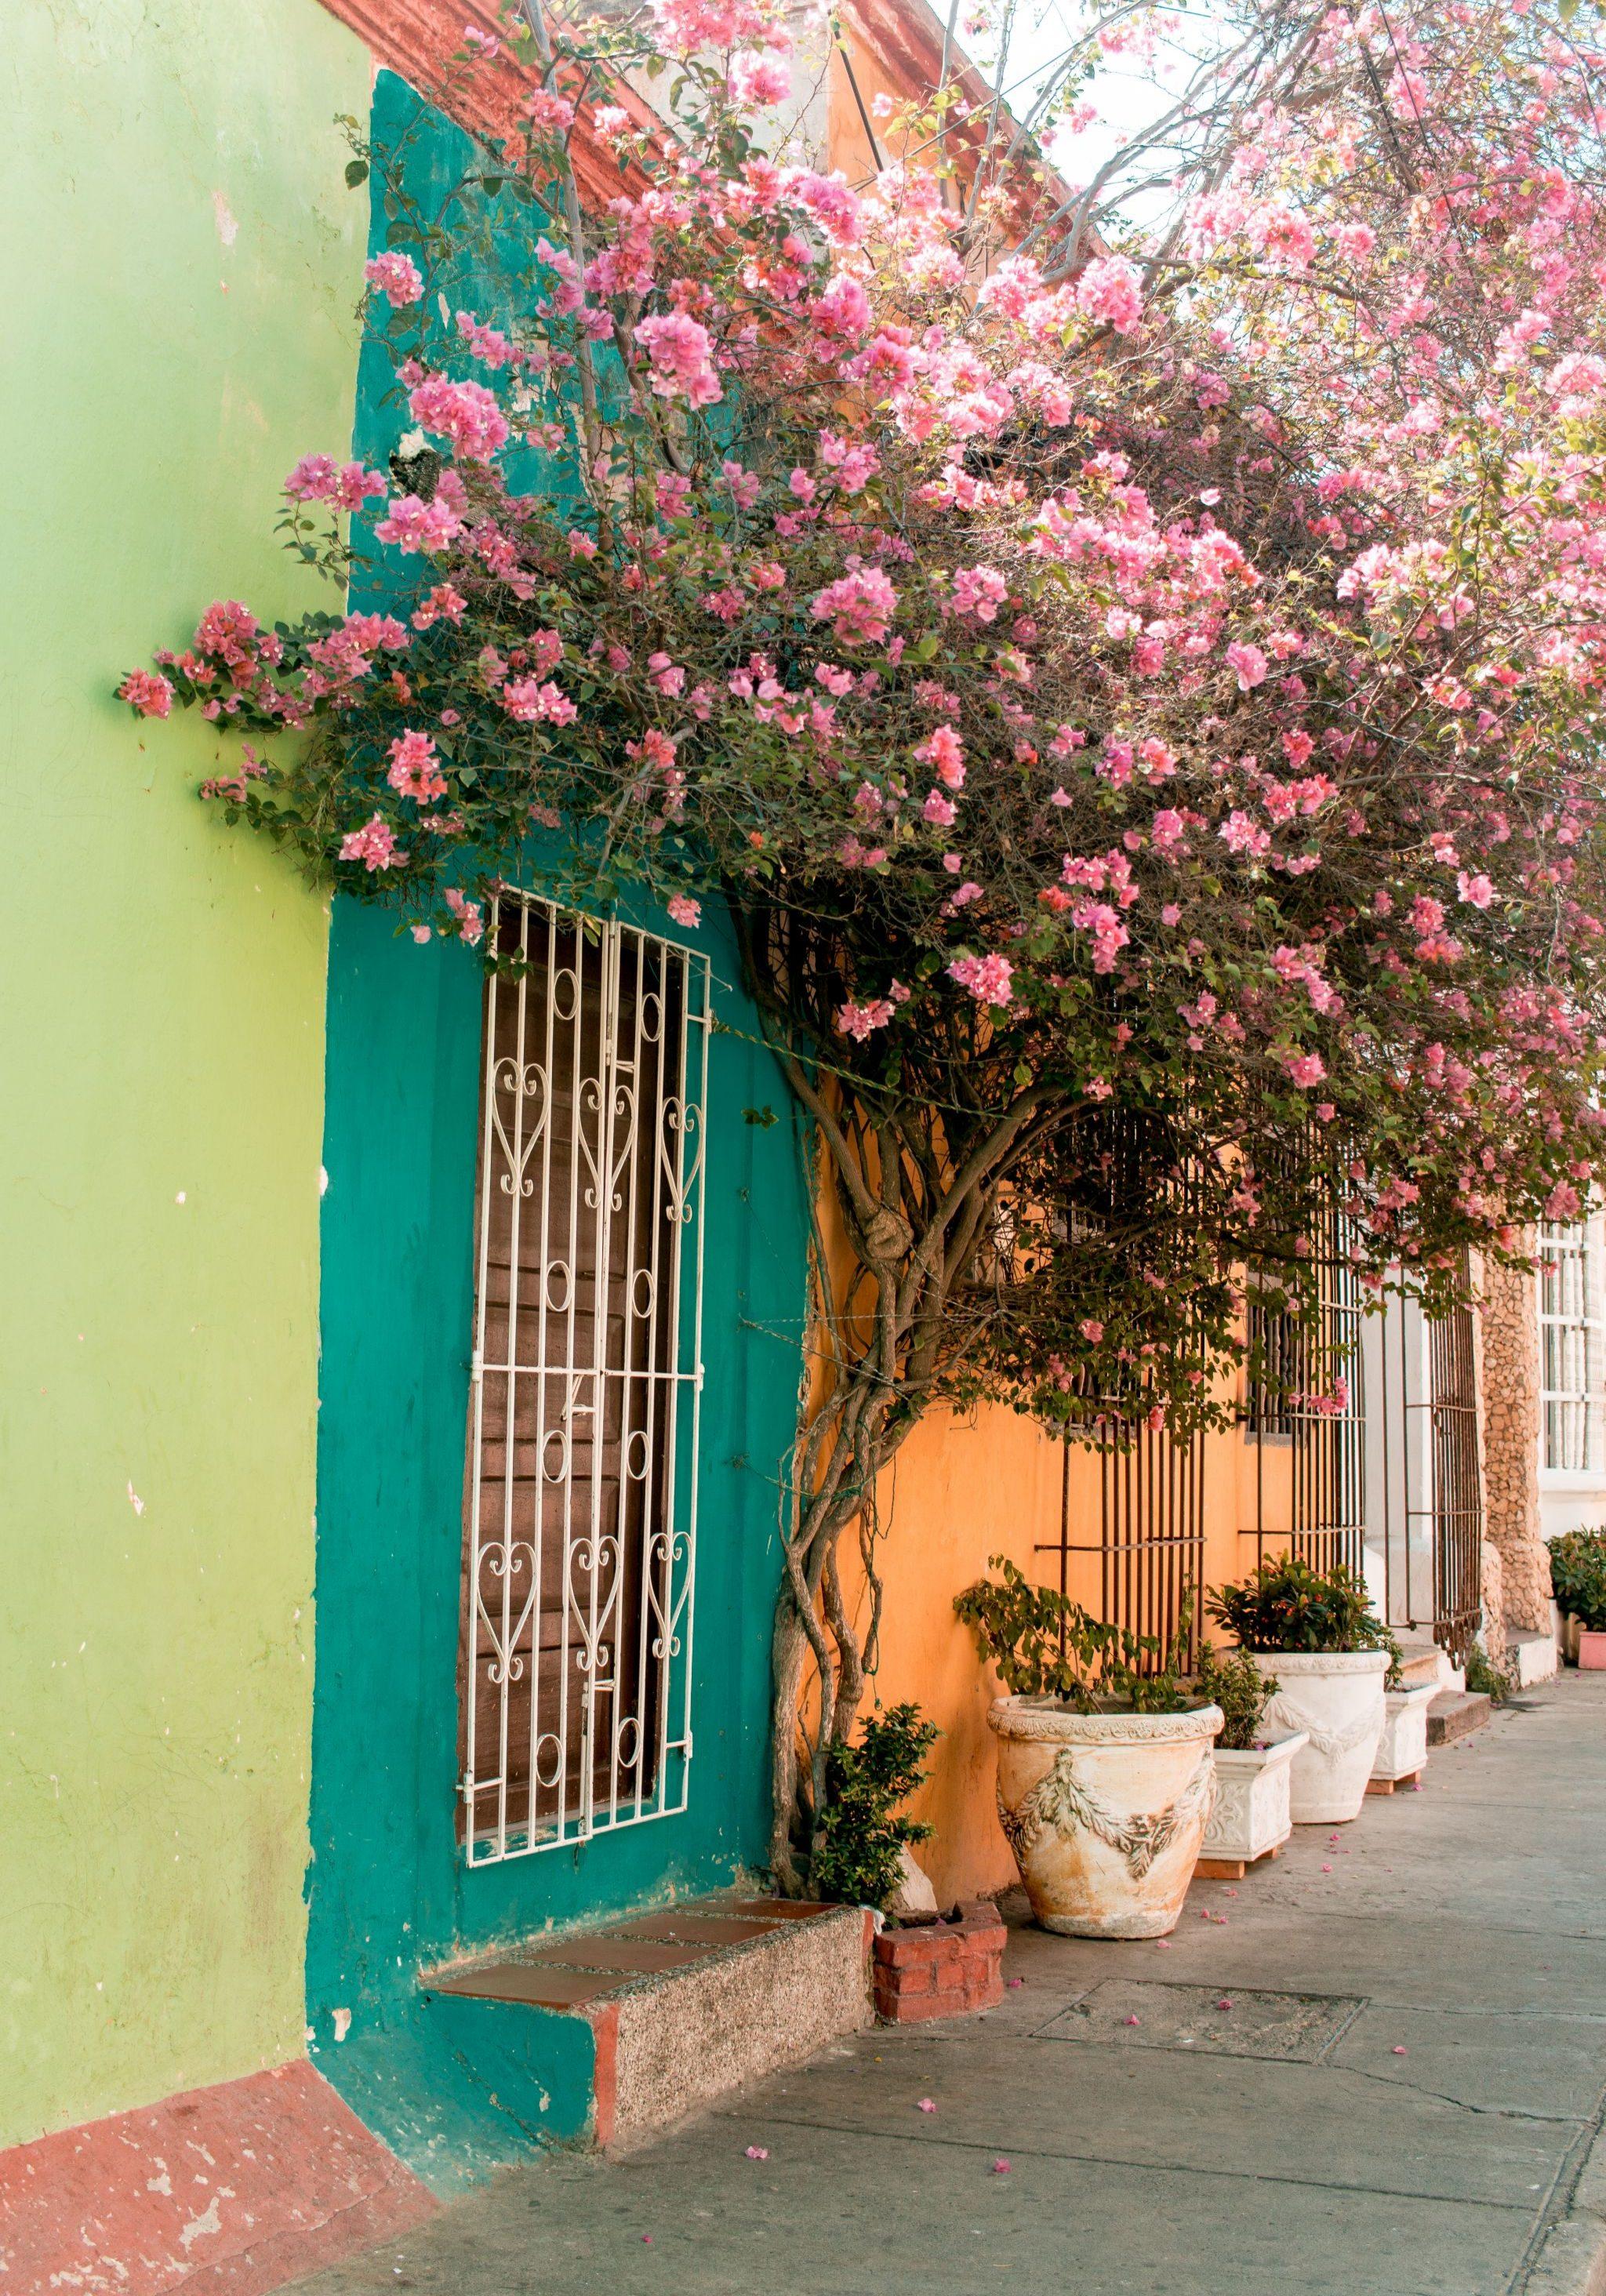 Colombia travel guide Getsemani street